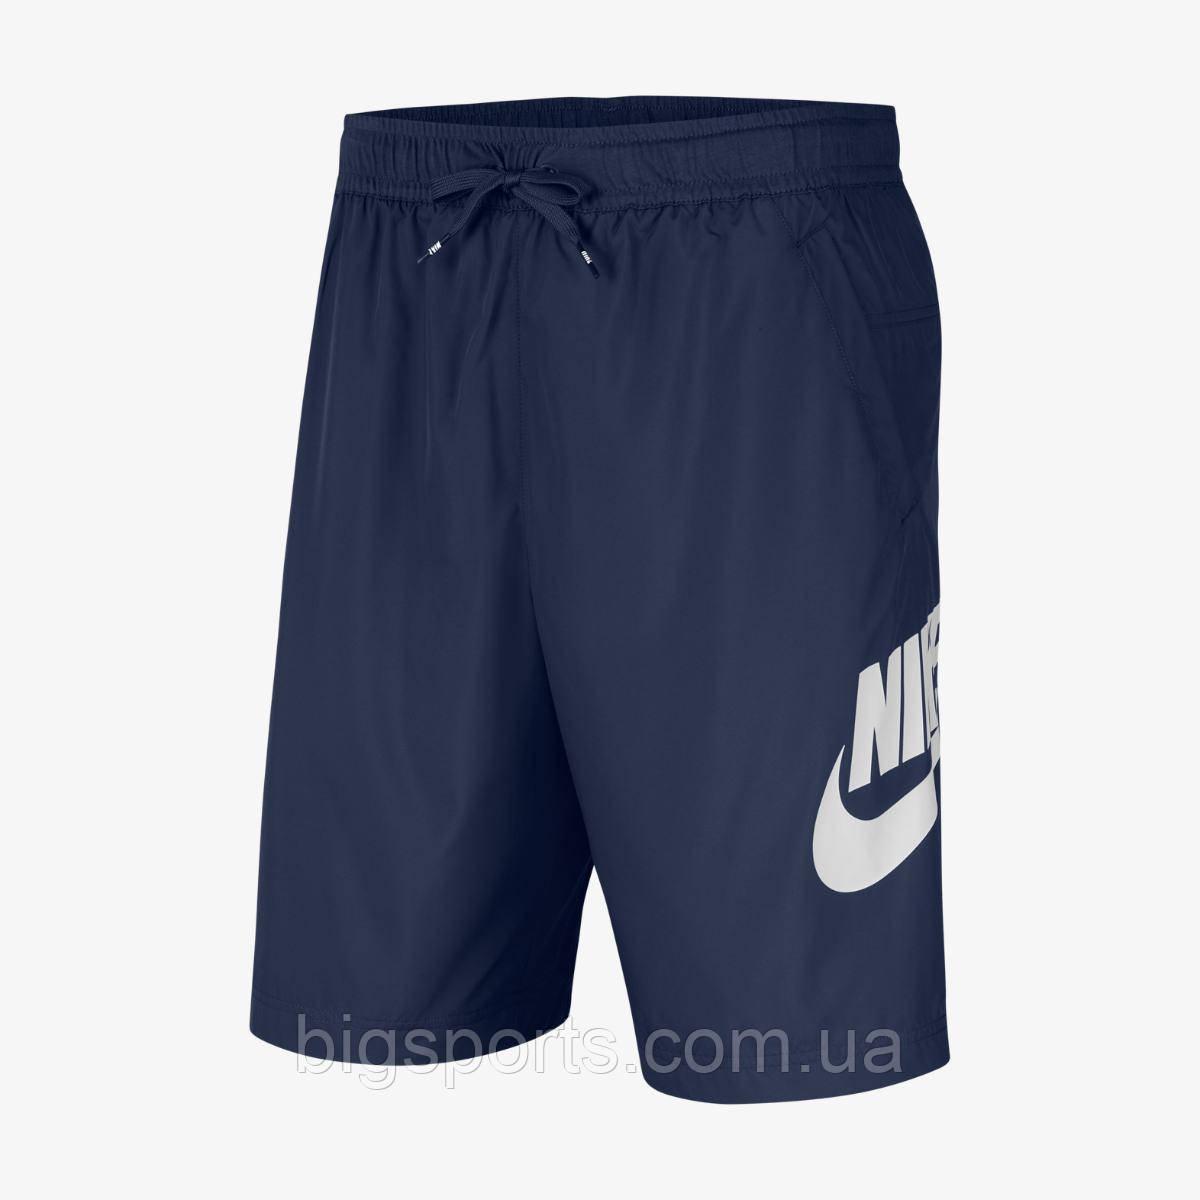 Шорты муж. Nike M Nsw Ce Short Wvn Hybrid (арт. CJ4440-410)